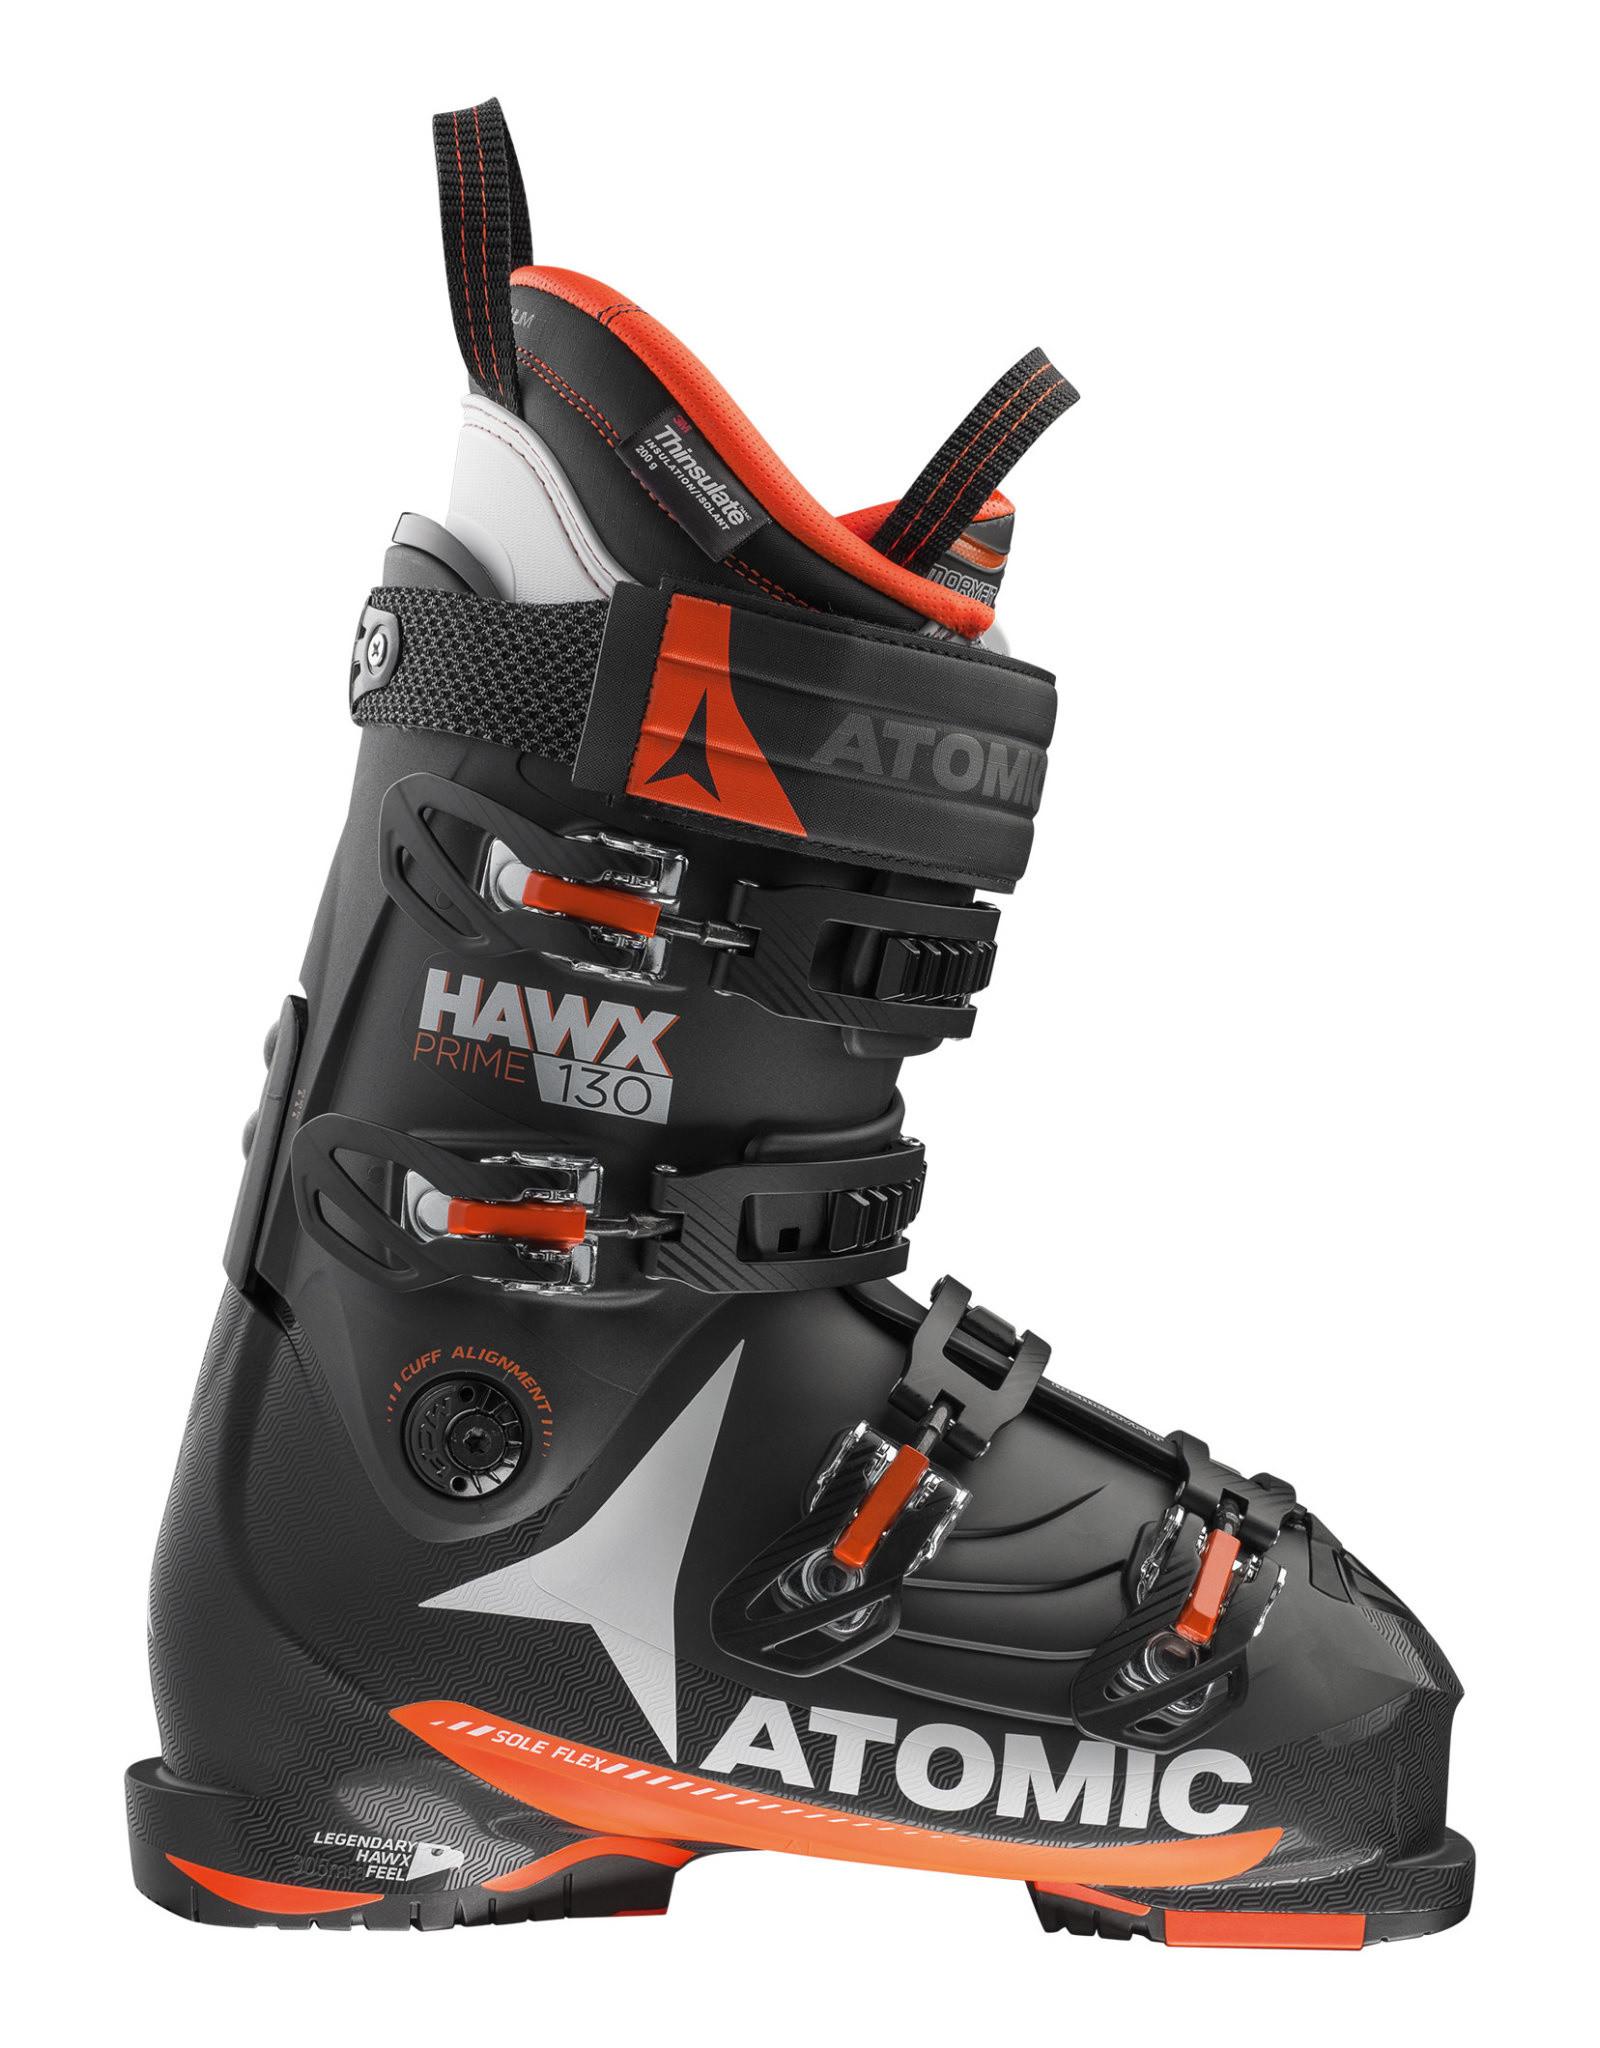 ATOMIC ATOMIC Ski Boots HAWX PRIME 130 (17/18)